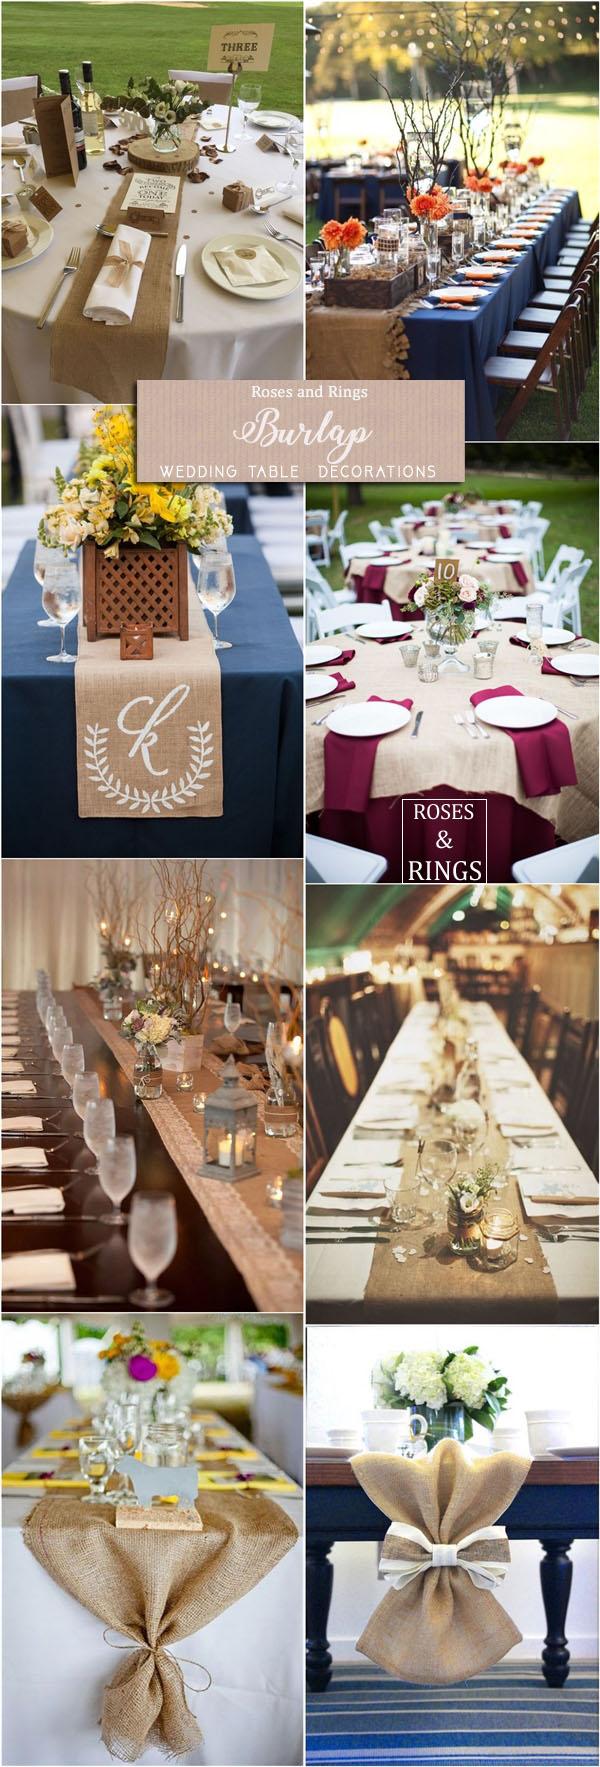 36 amazing rustic country burlap wedding decor ideas roses rings burlap wedding table decor ideas junglespirit Images